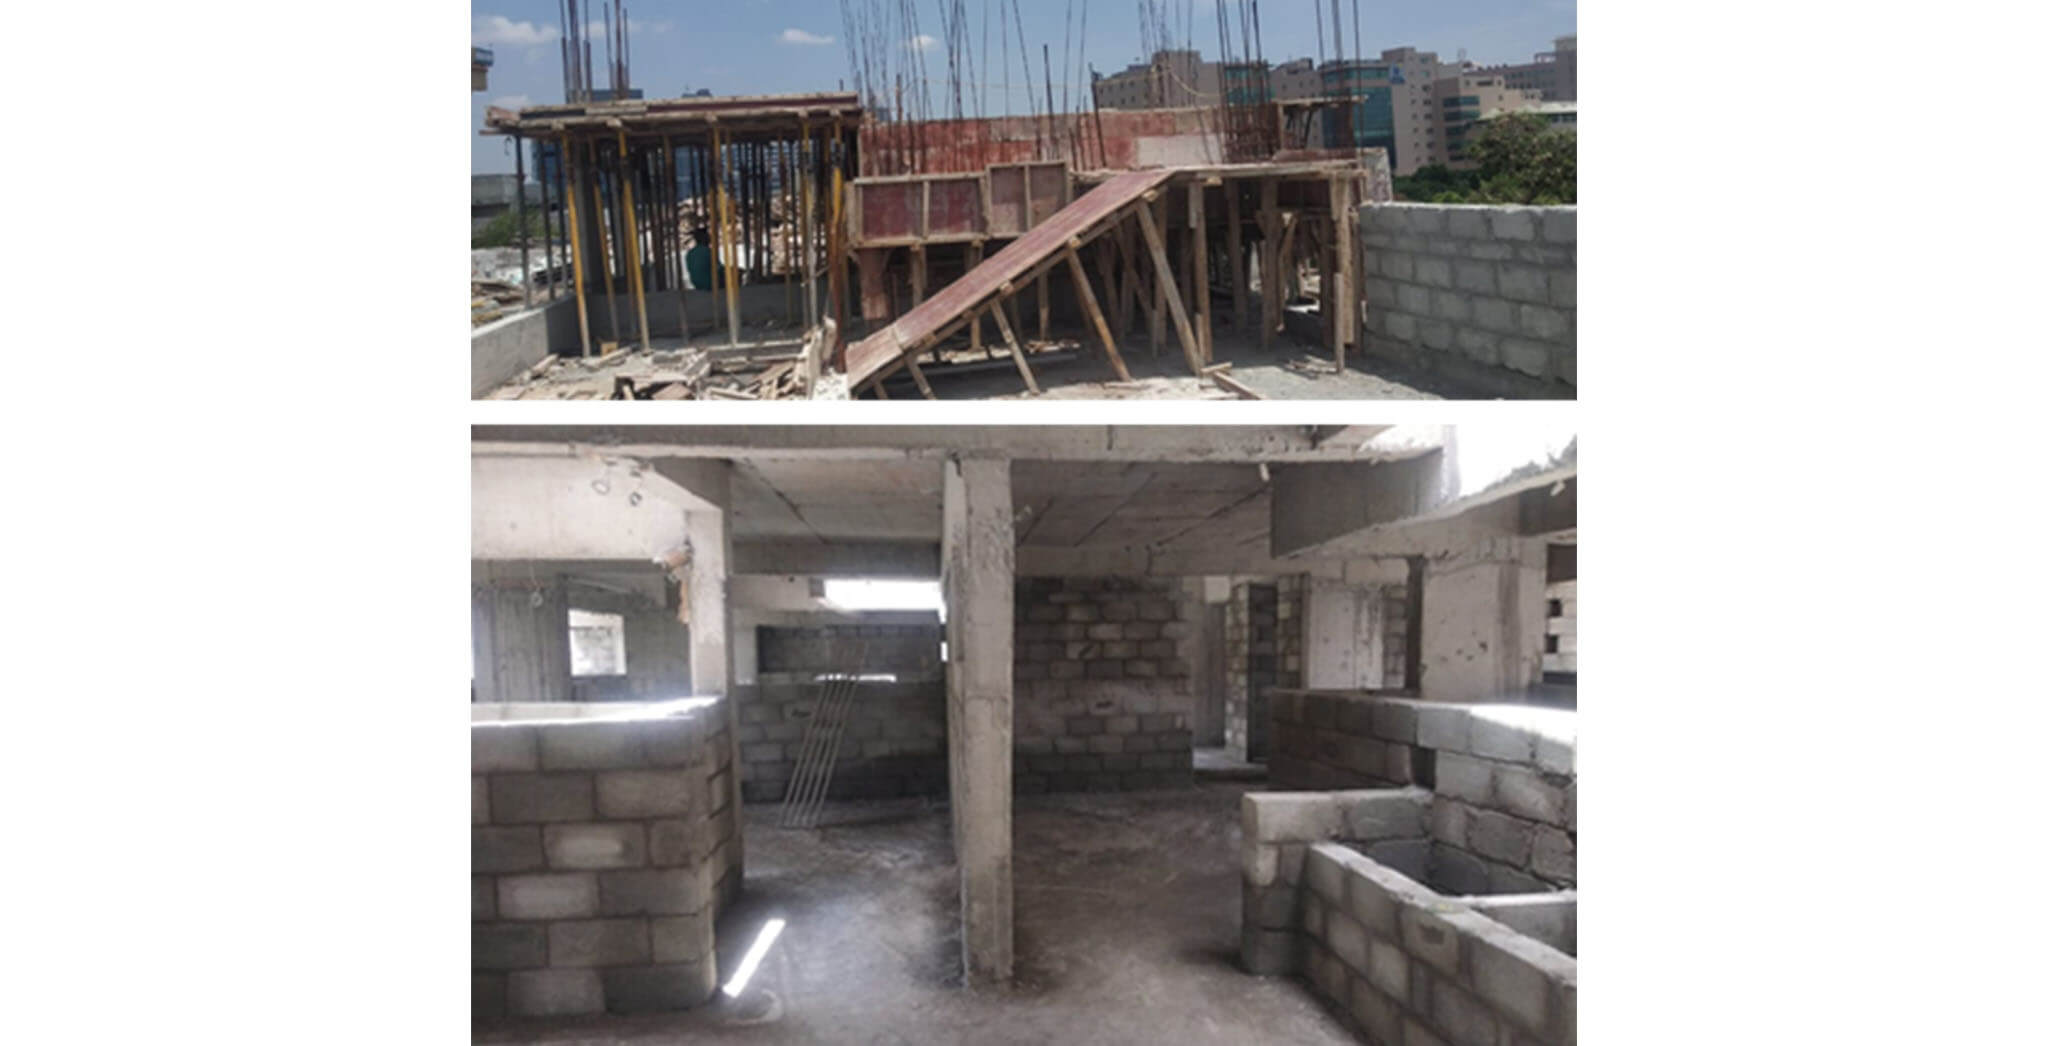 May 2021 - D Block: SHR and LMR bottom shuttering and 4th floor block work-in-progress.